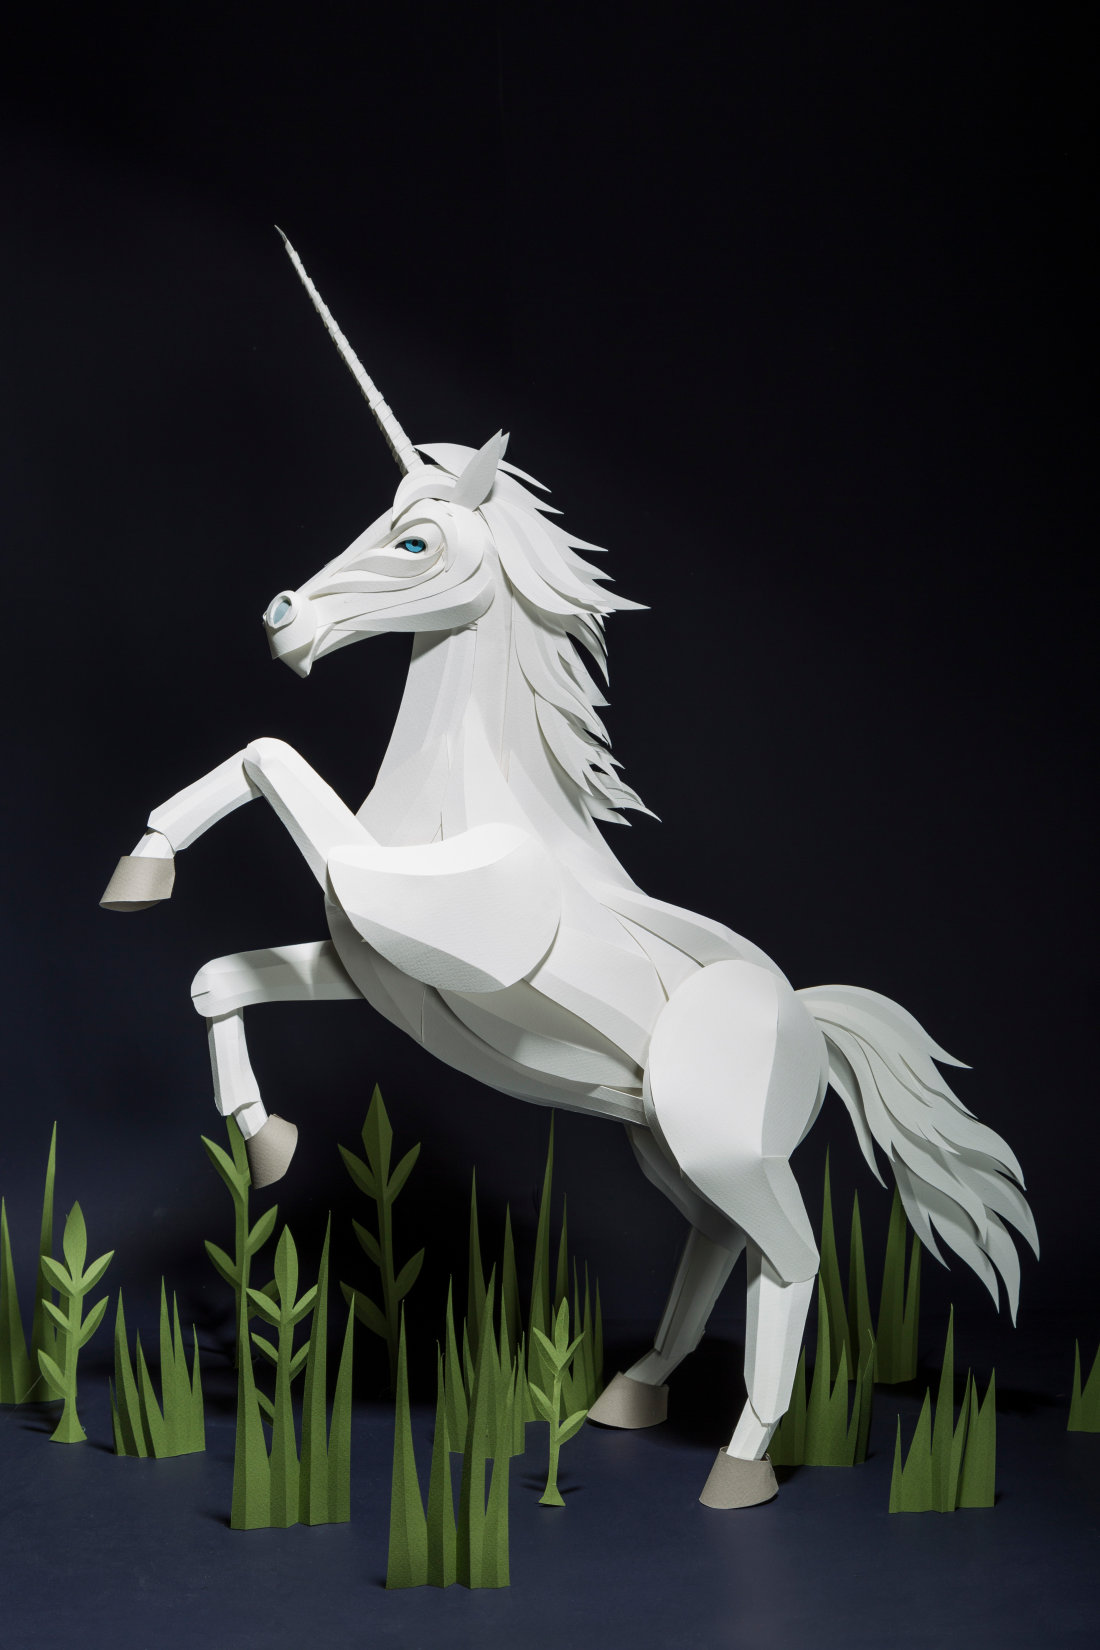 Unicorn Harry Potter Wiki Fandom